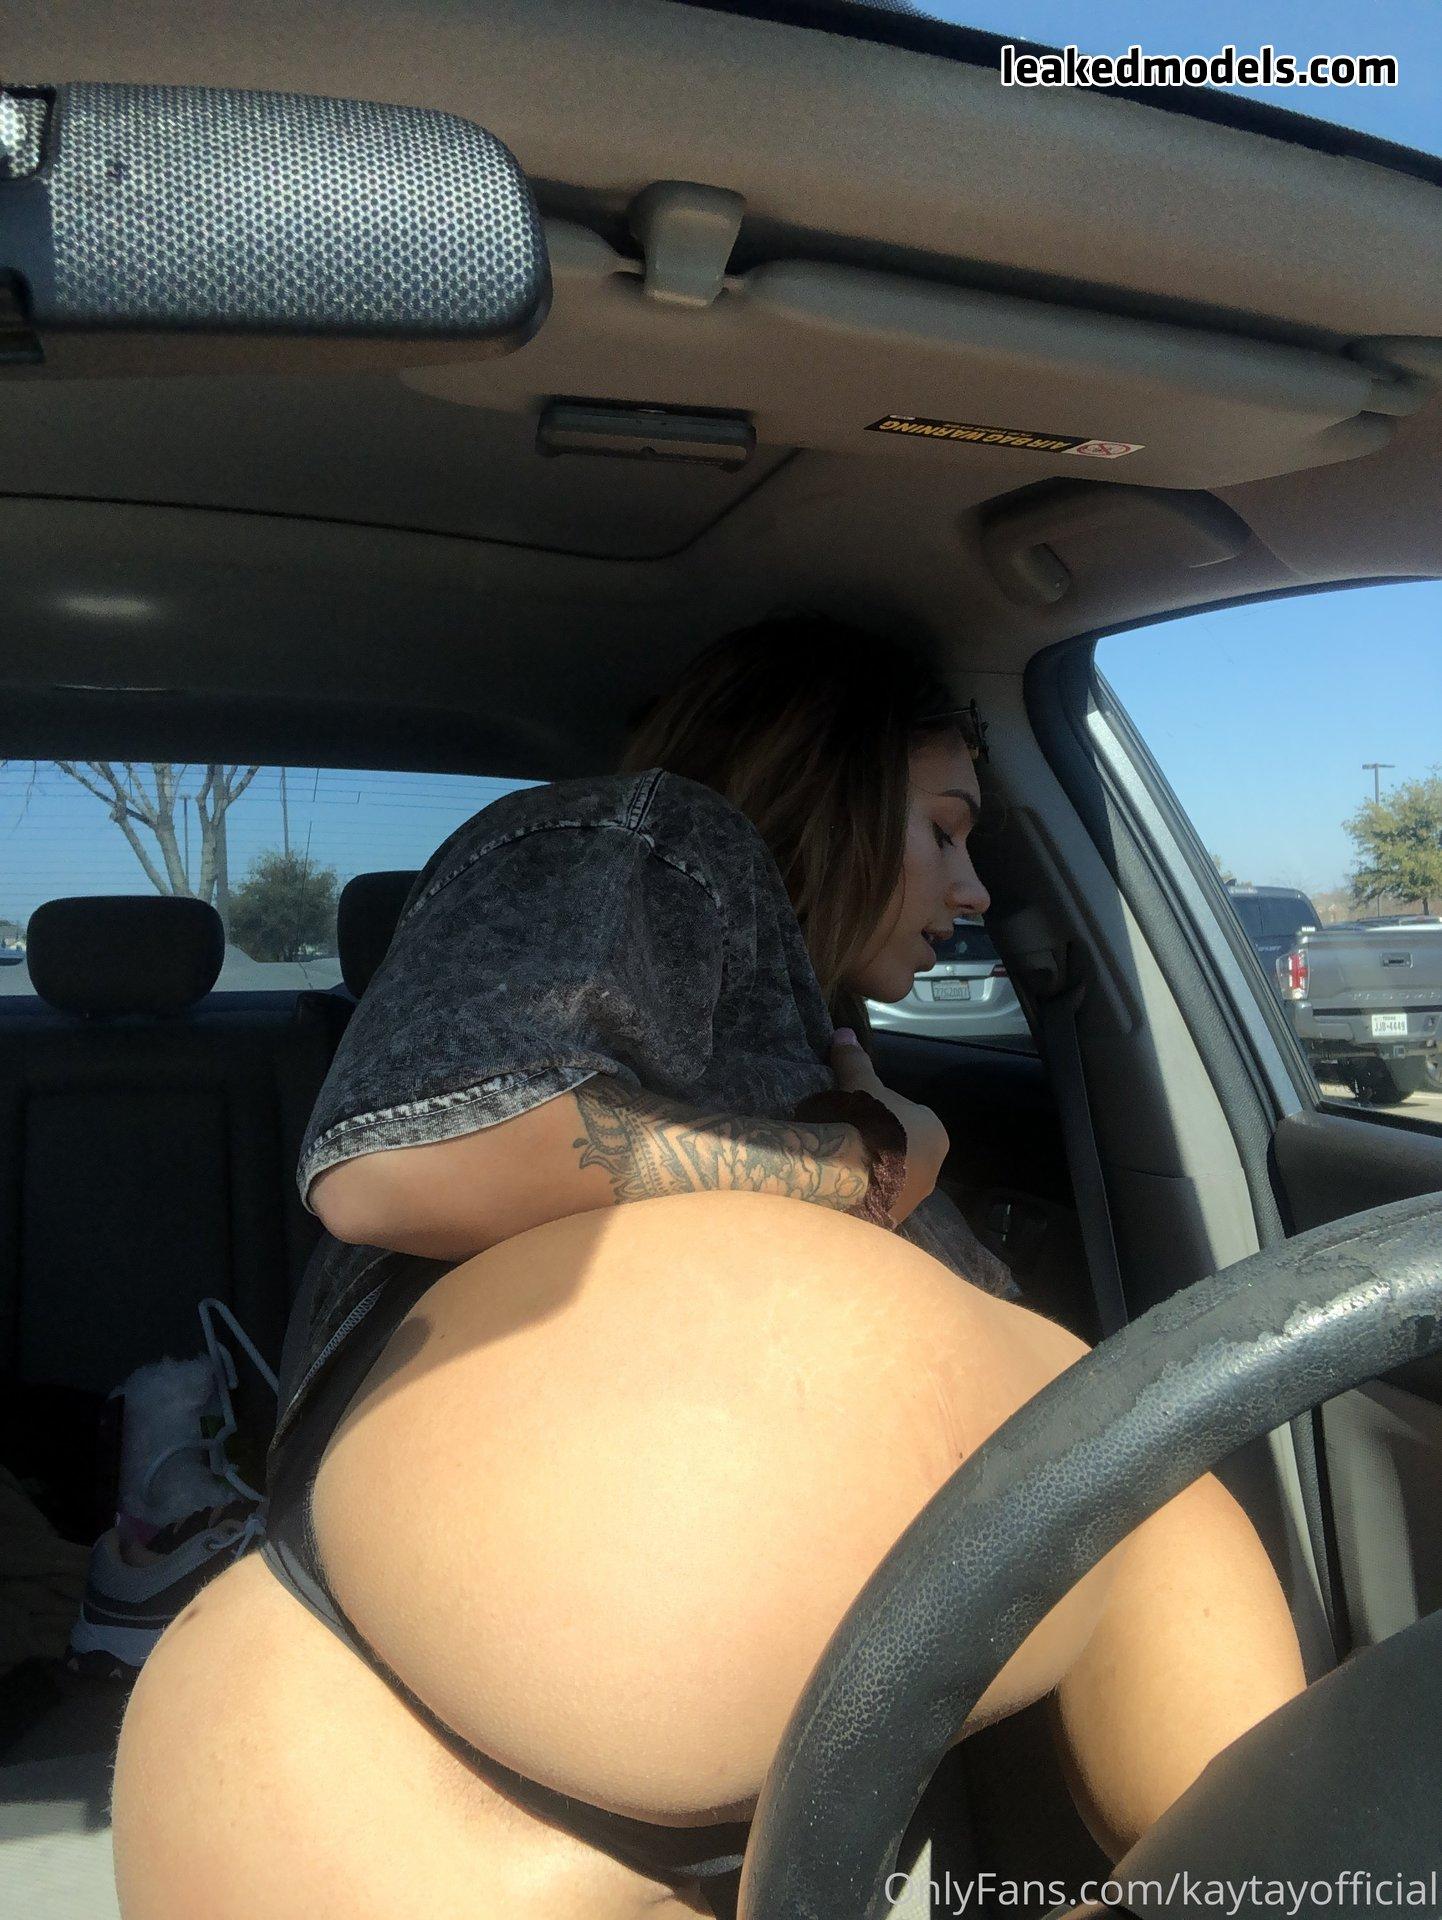 khalakki_ OnlyFans Nude Leaks (30 Photos)